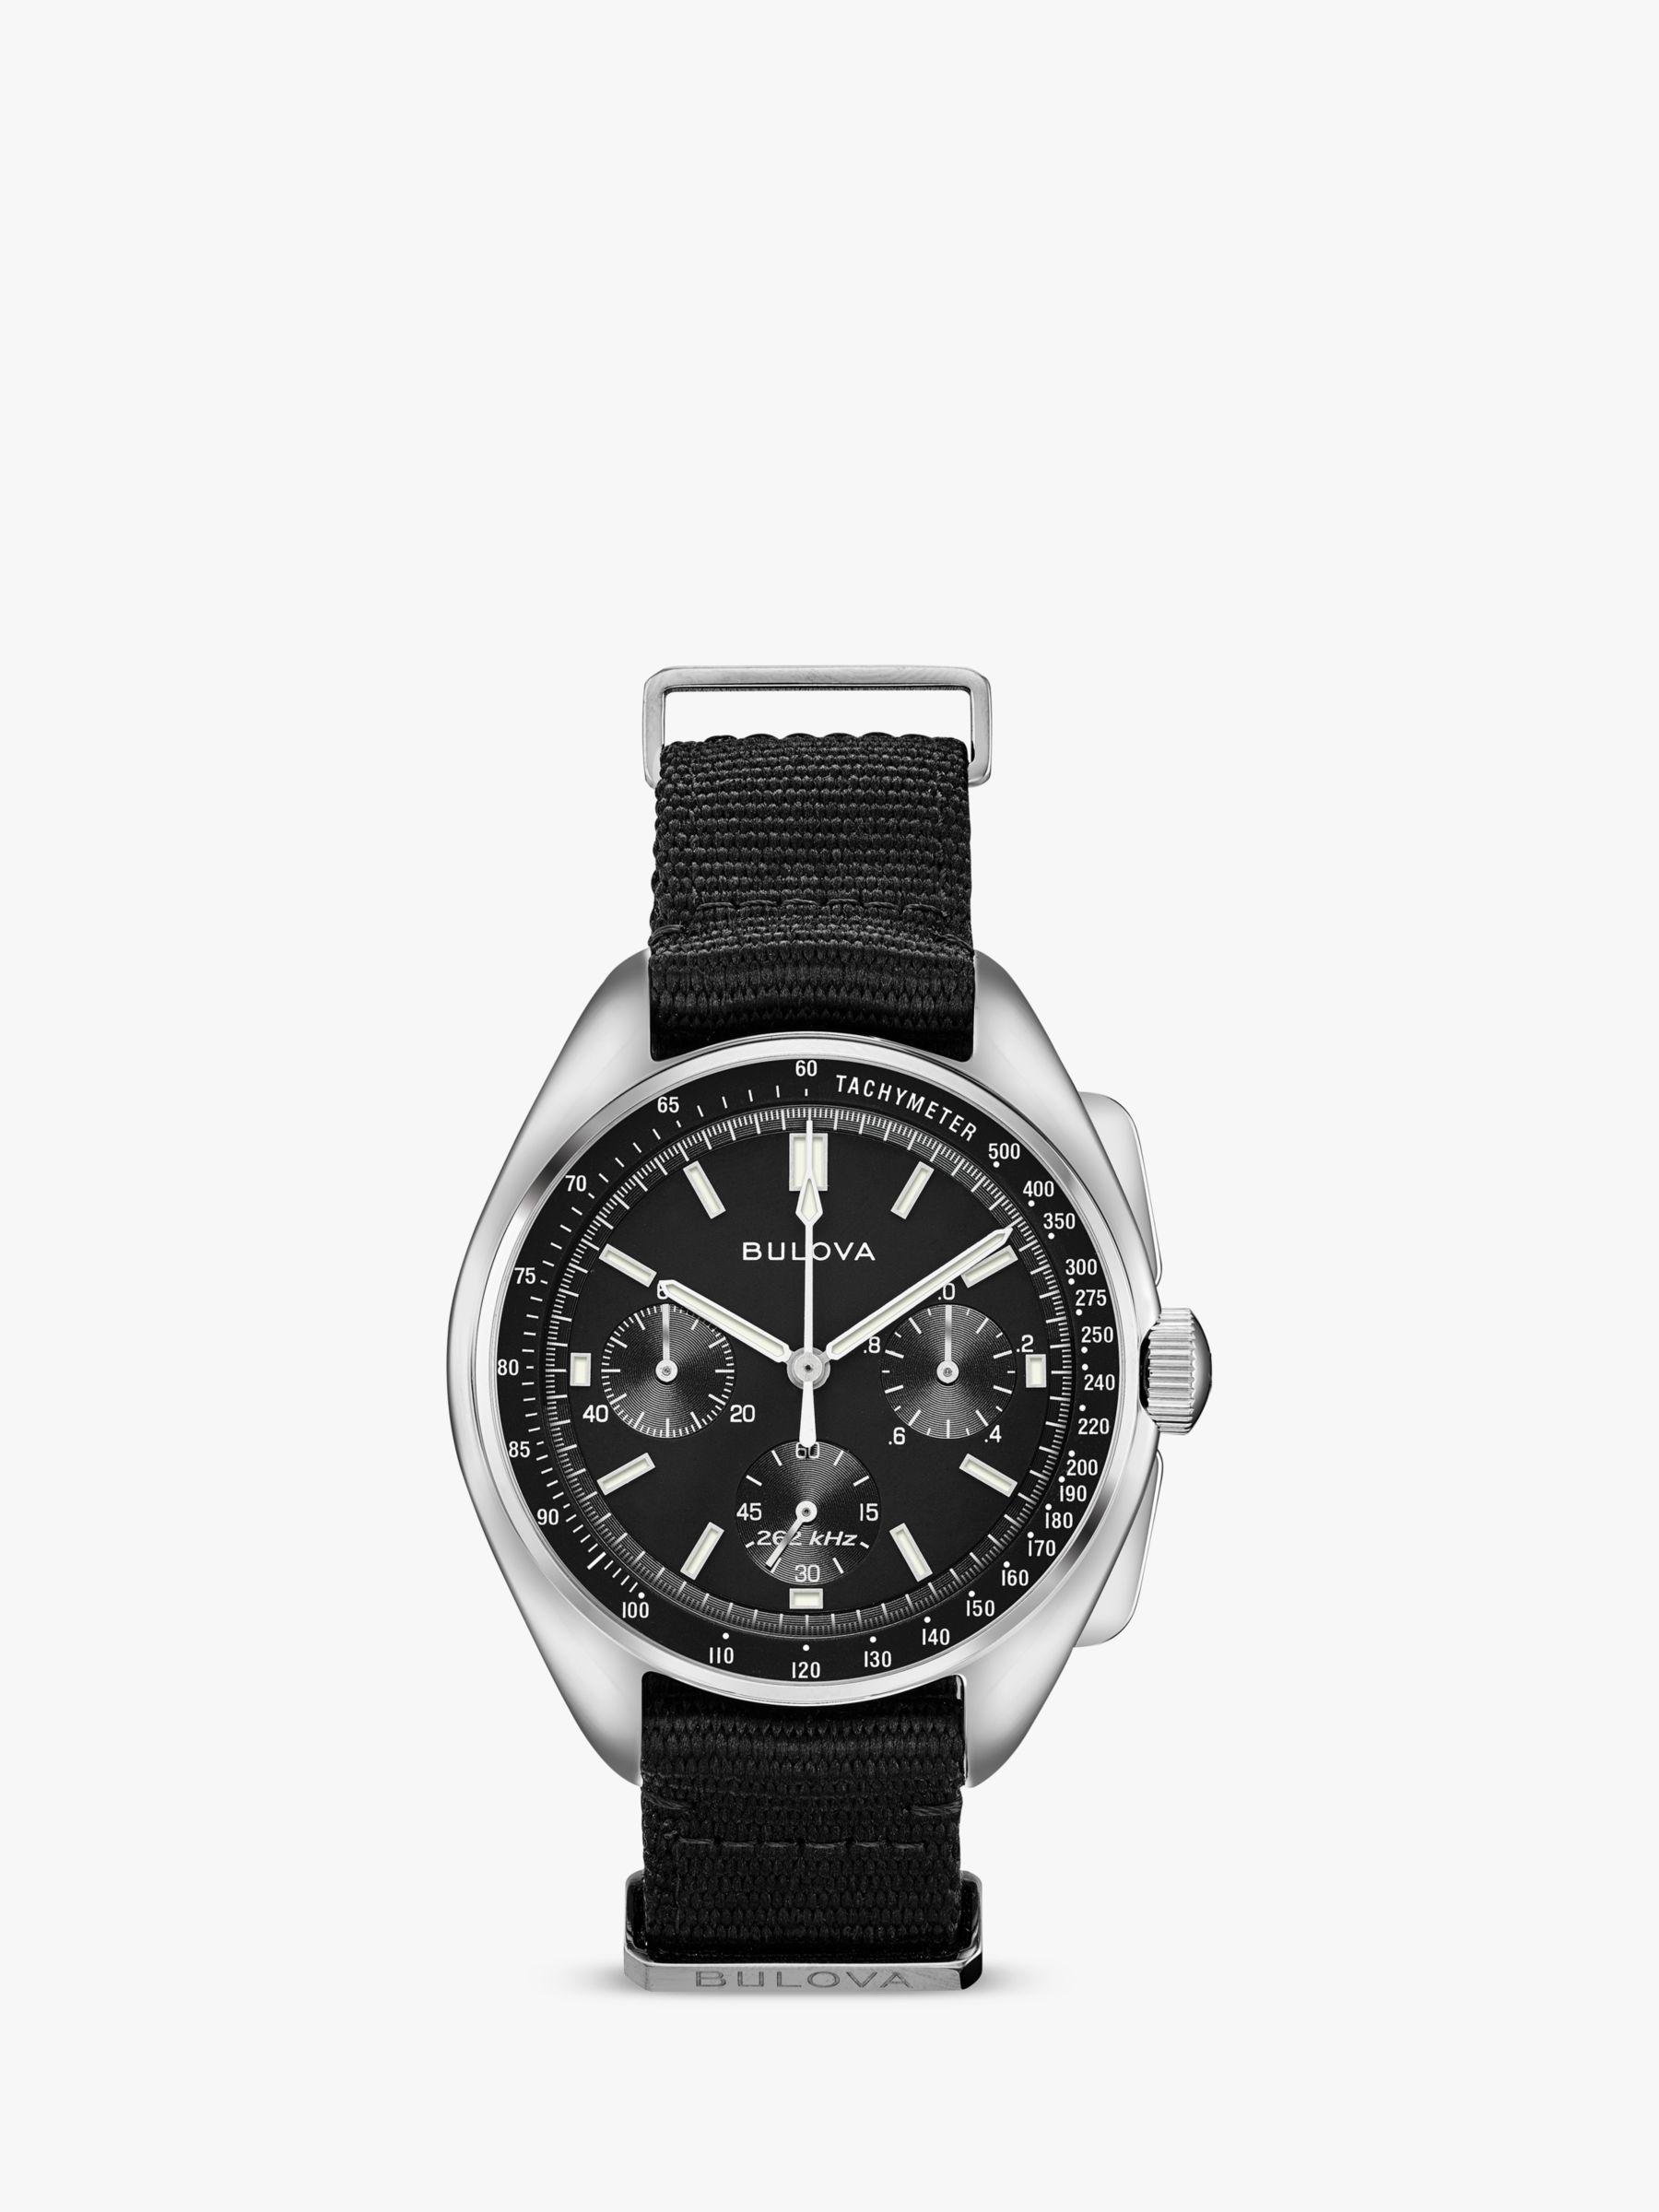 Bulova Bulova 96A225 Men's Archive Lunar Pilot Date Single Chronograph Fabric Strap Watch, Black